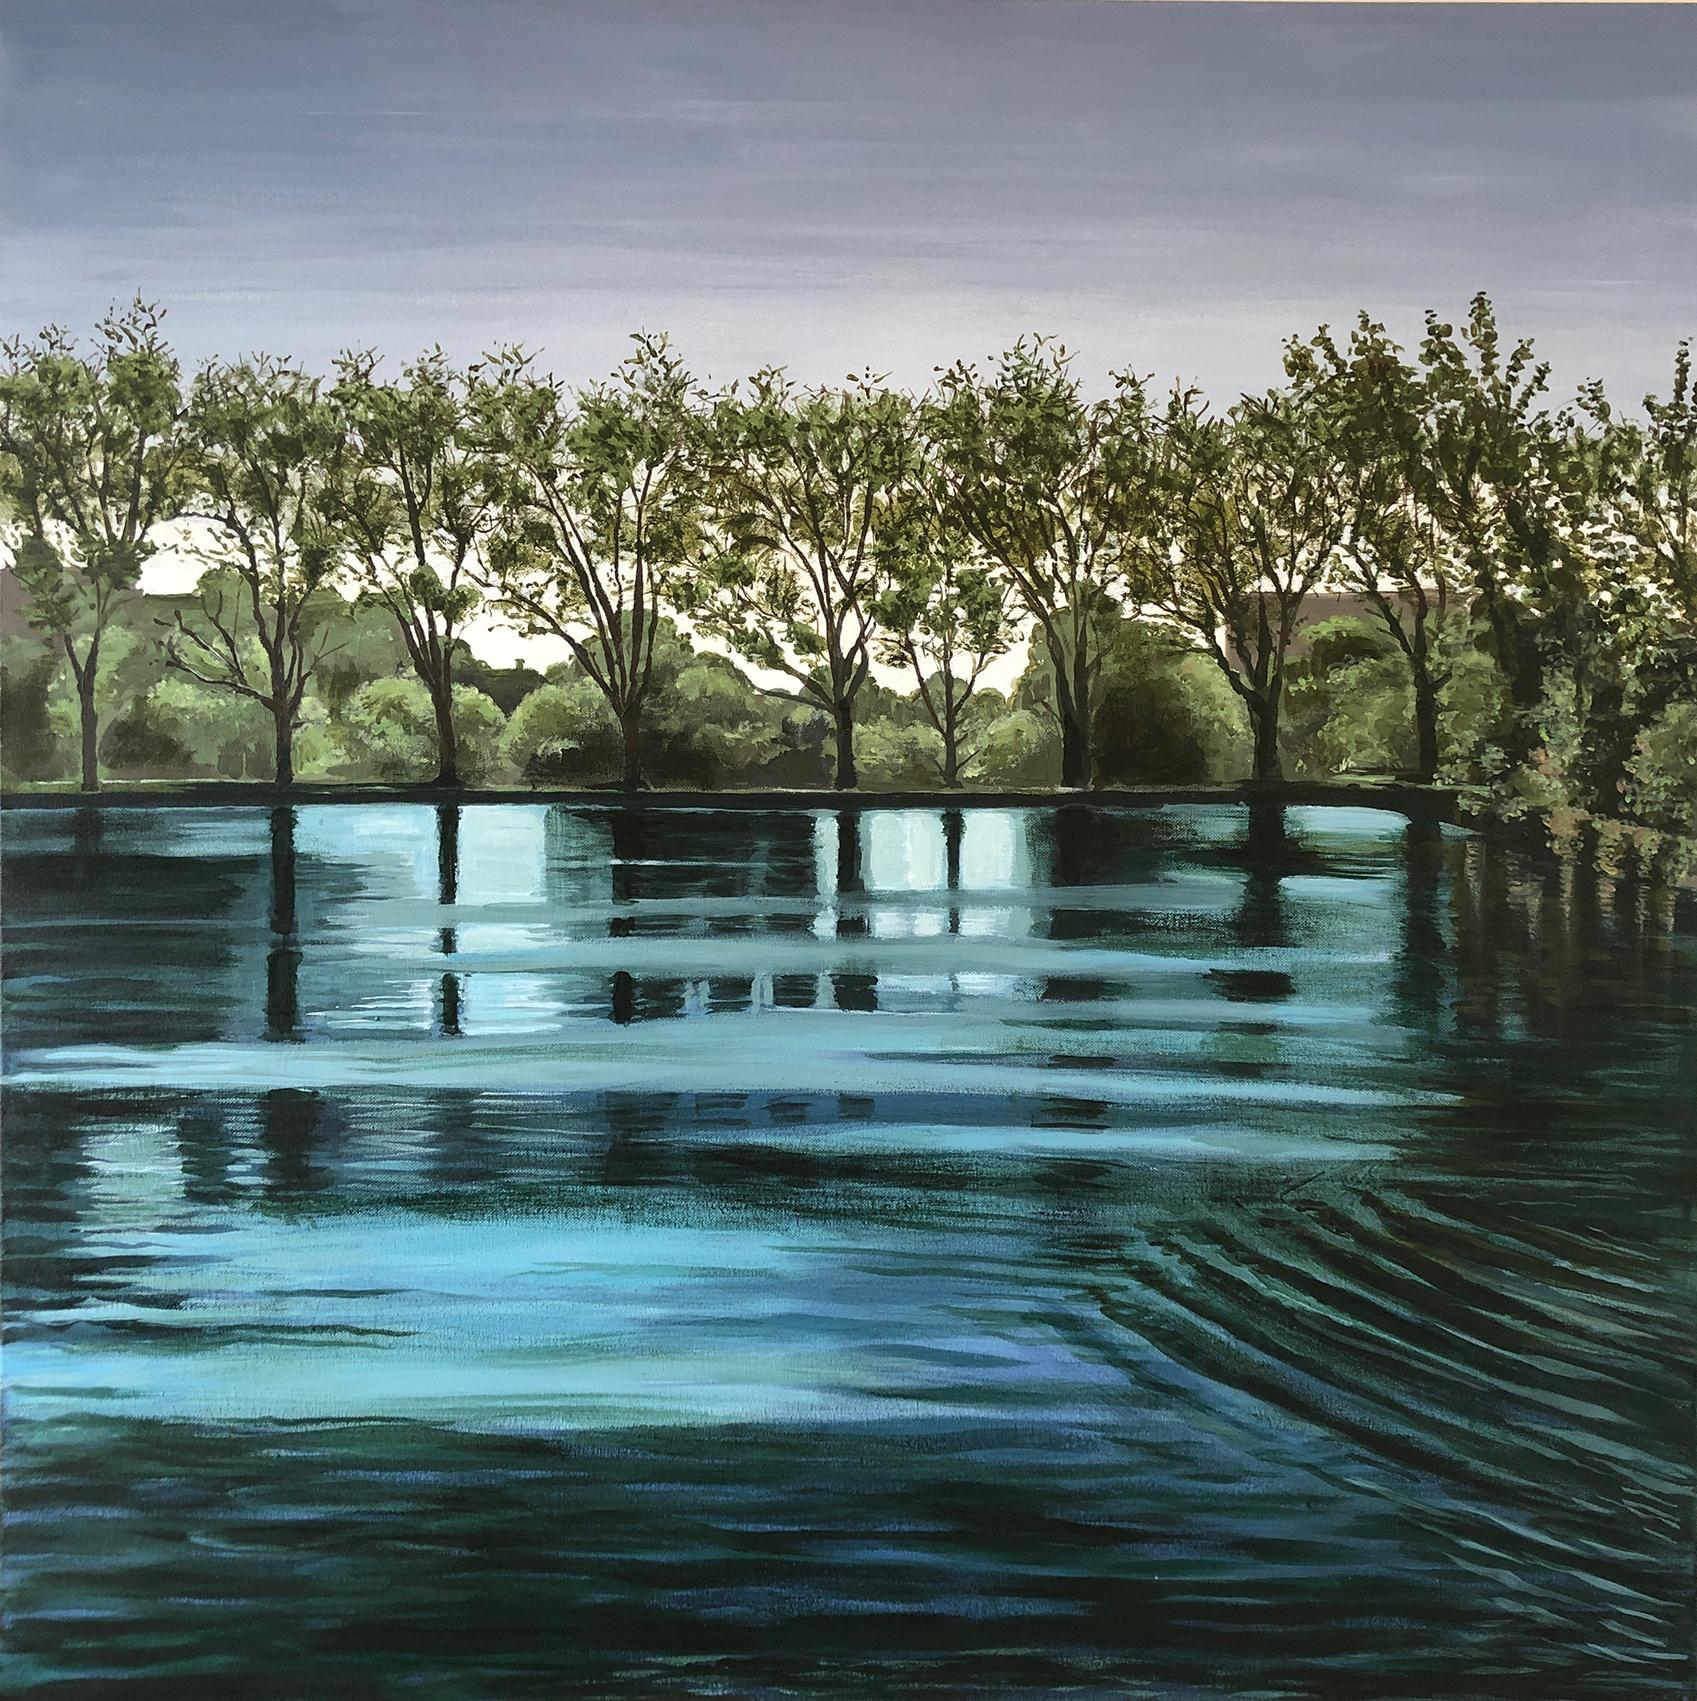 'Hamptead Pond, Looking South'